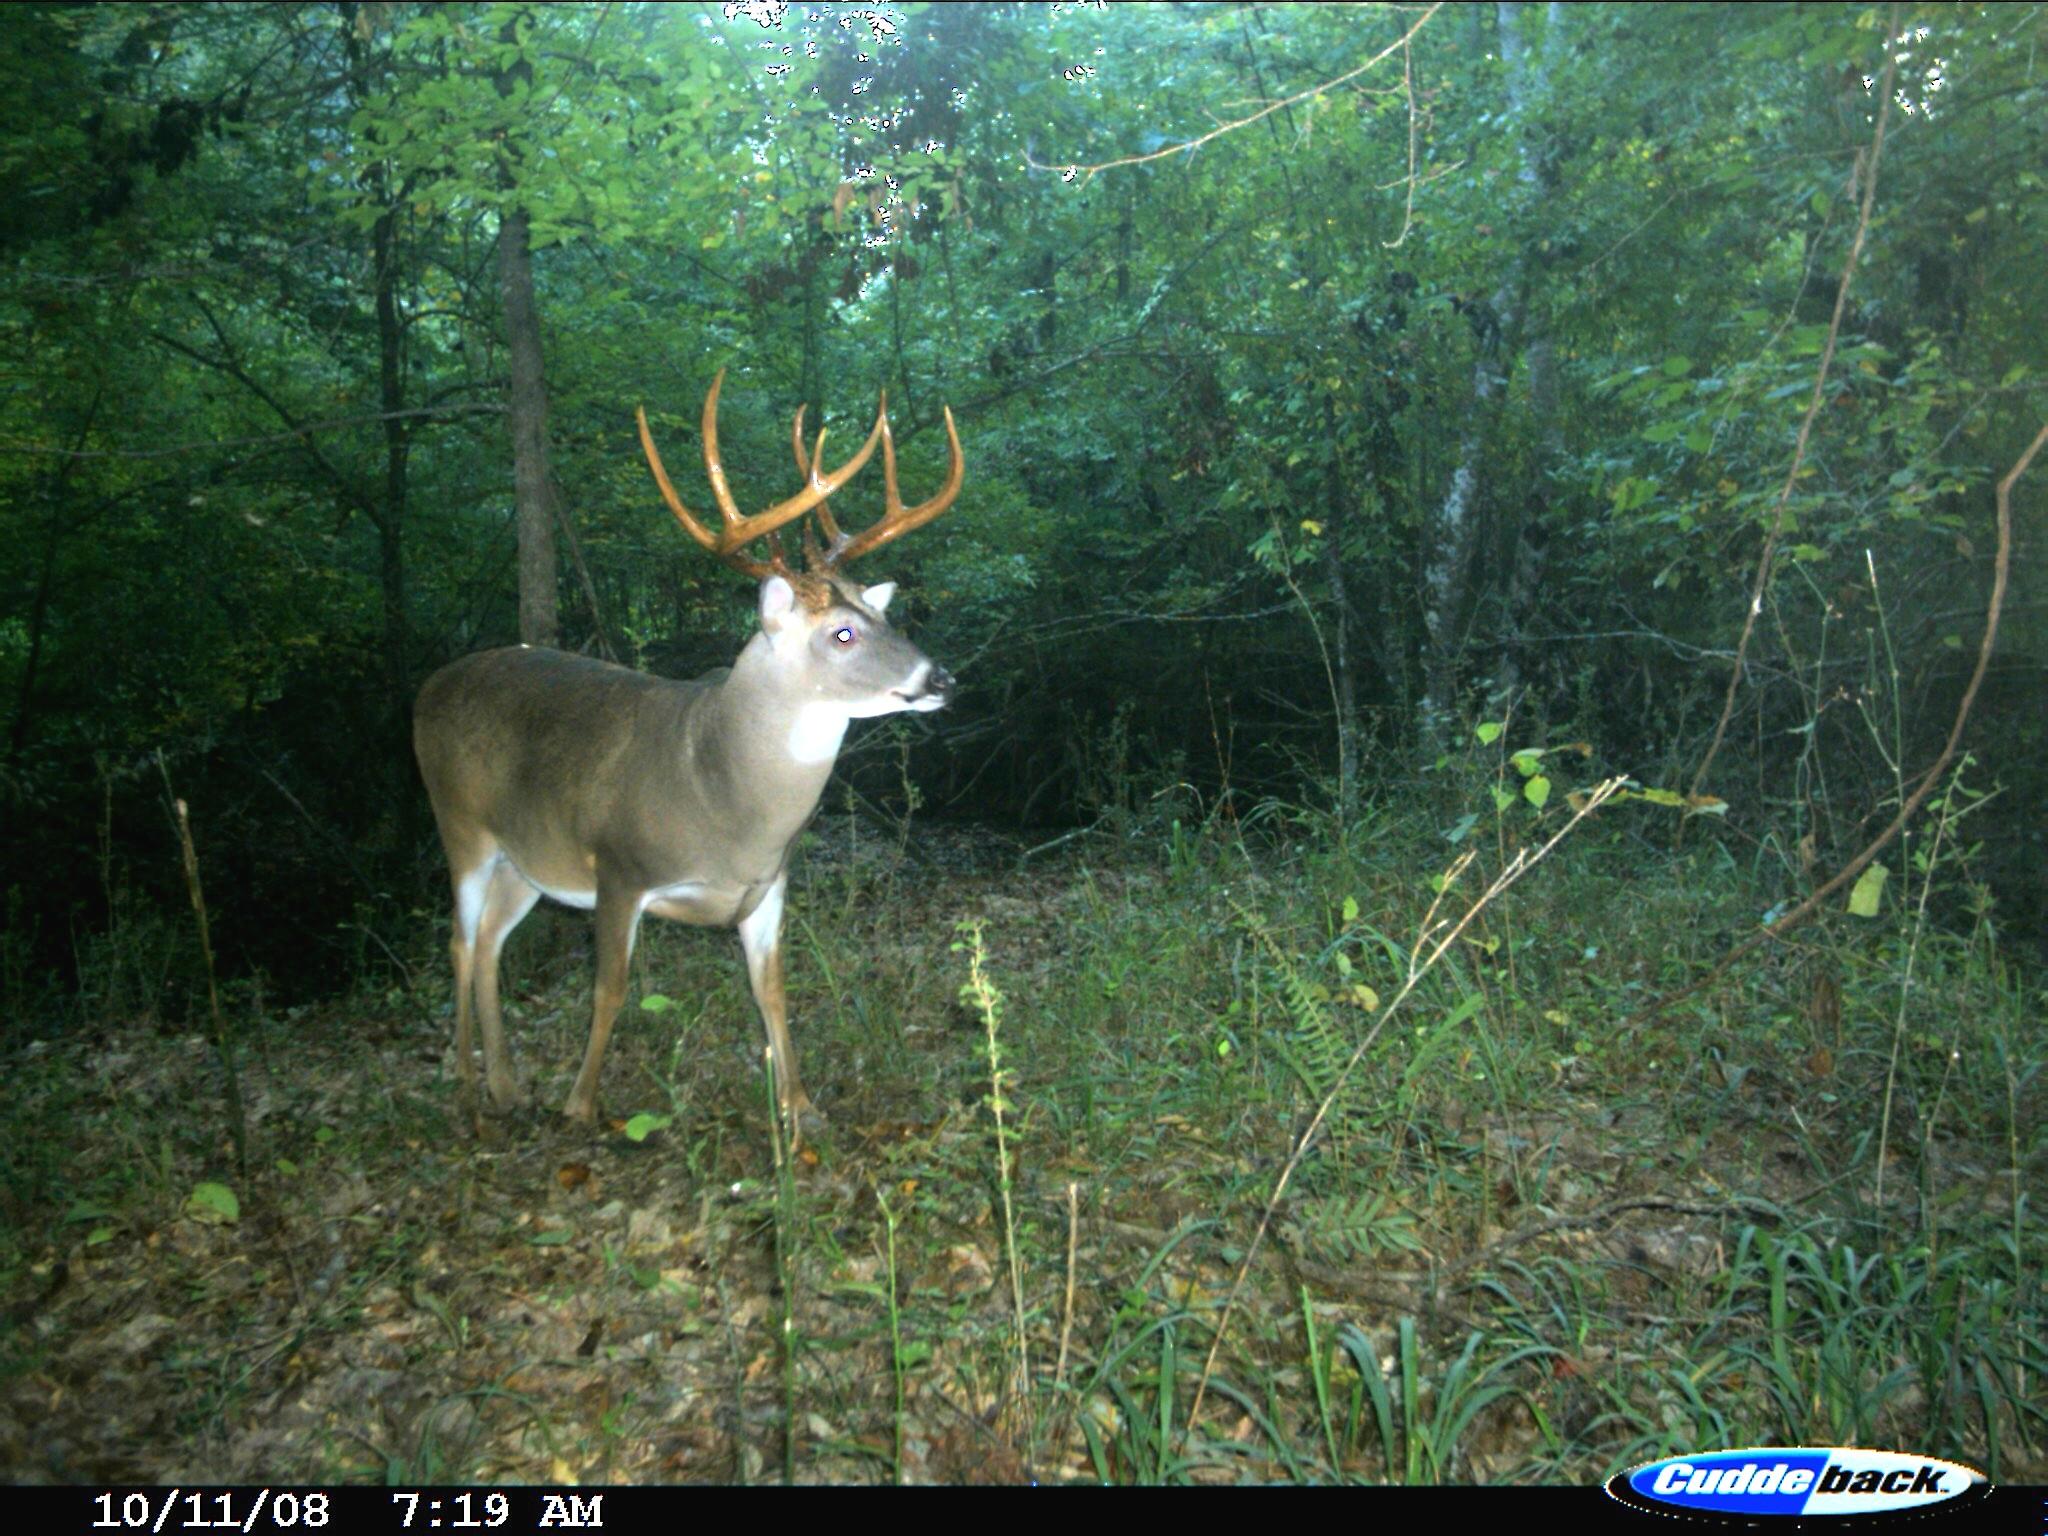 Exclusive: Peak 2016 Rut Forecast For Southern Deer Hunters - with regard to Deer Rut Calendar